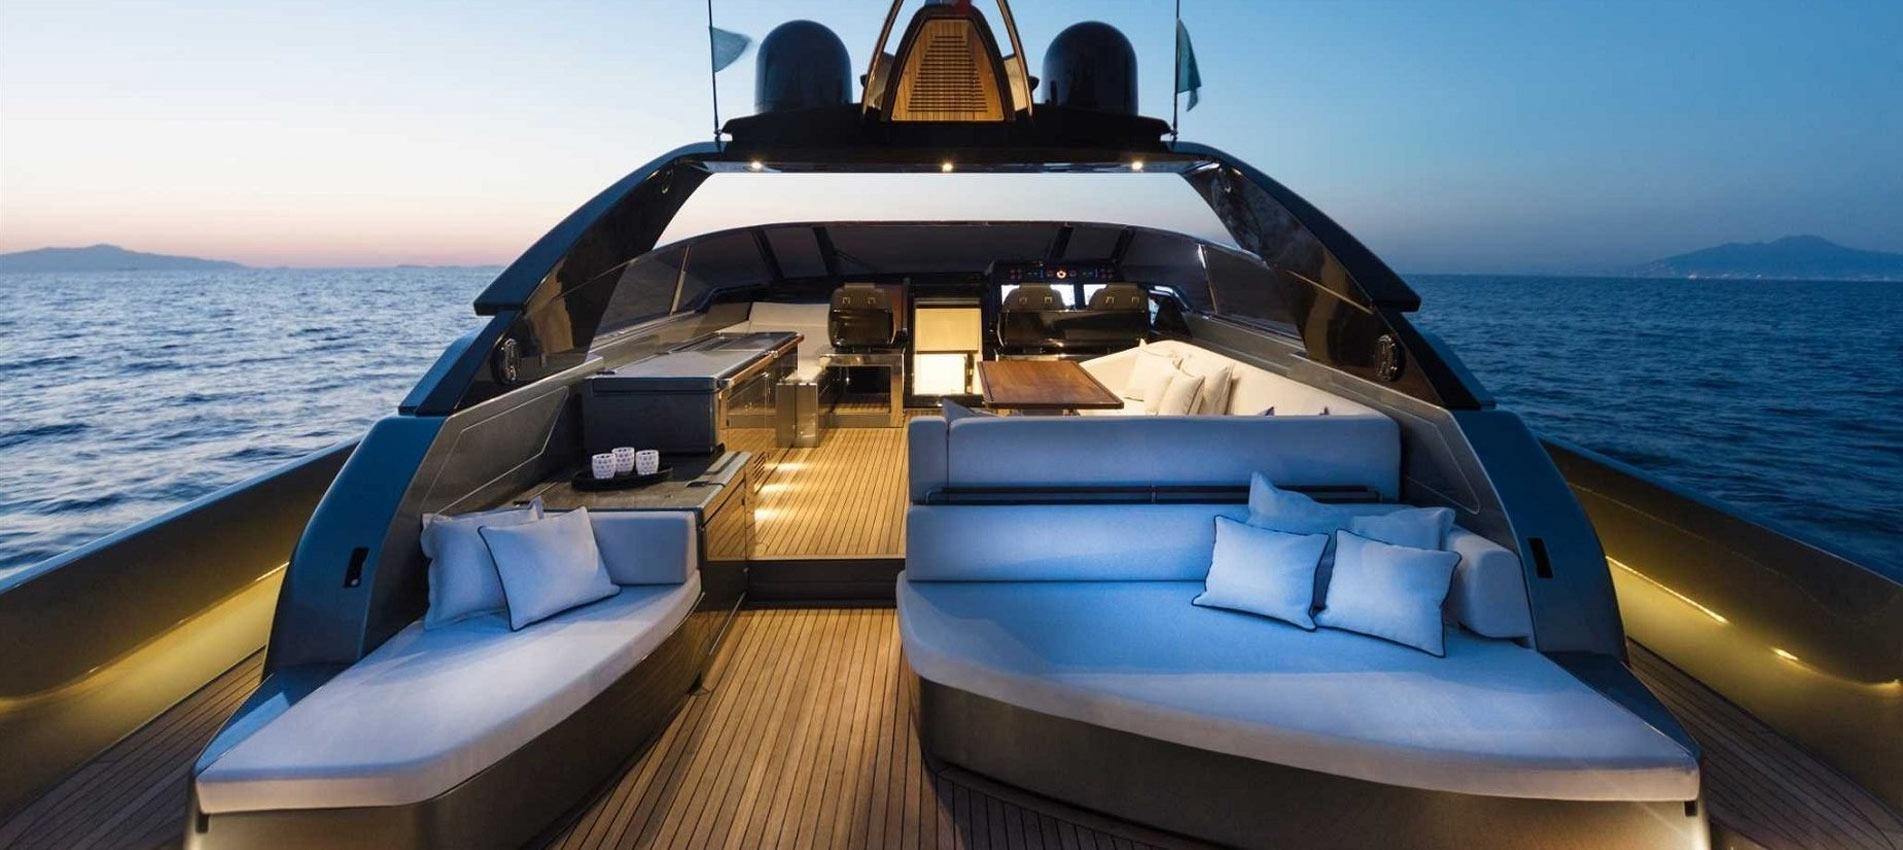 Modelluebersicht-Riva-Yachten-und-Boote-by-Poroli-Special-Boats